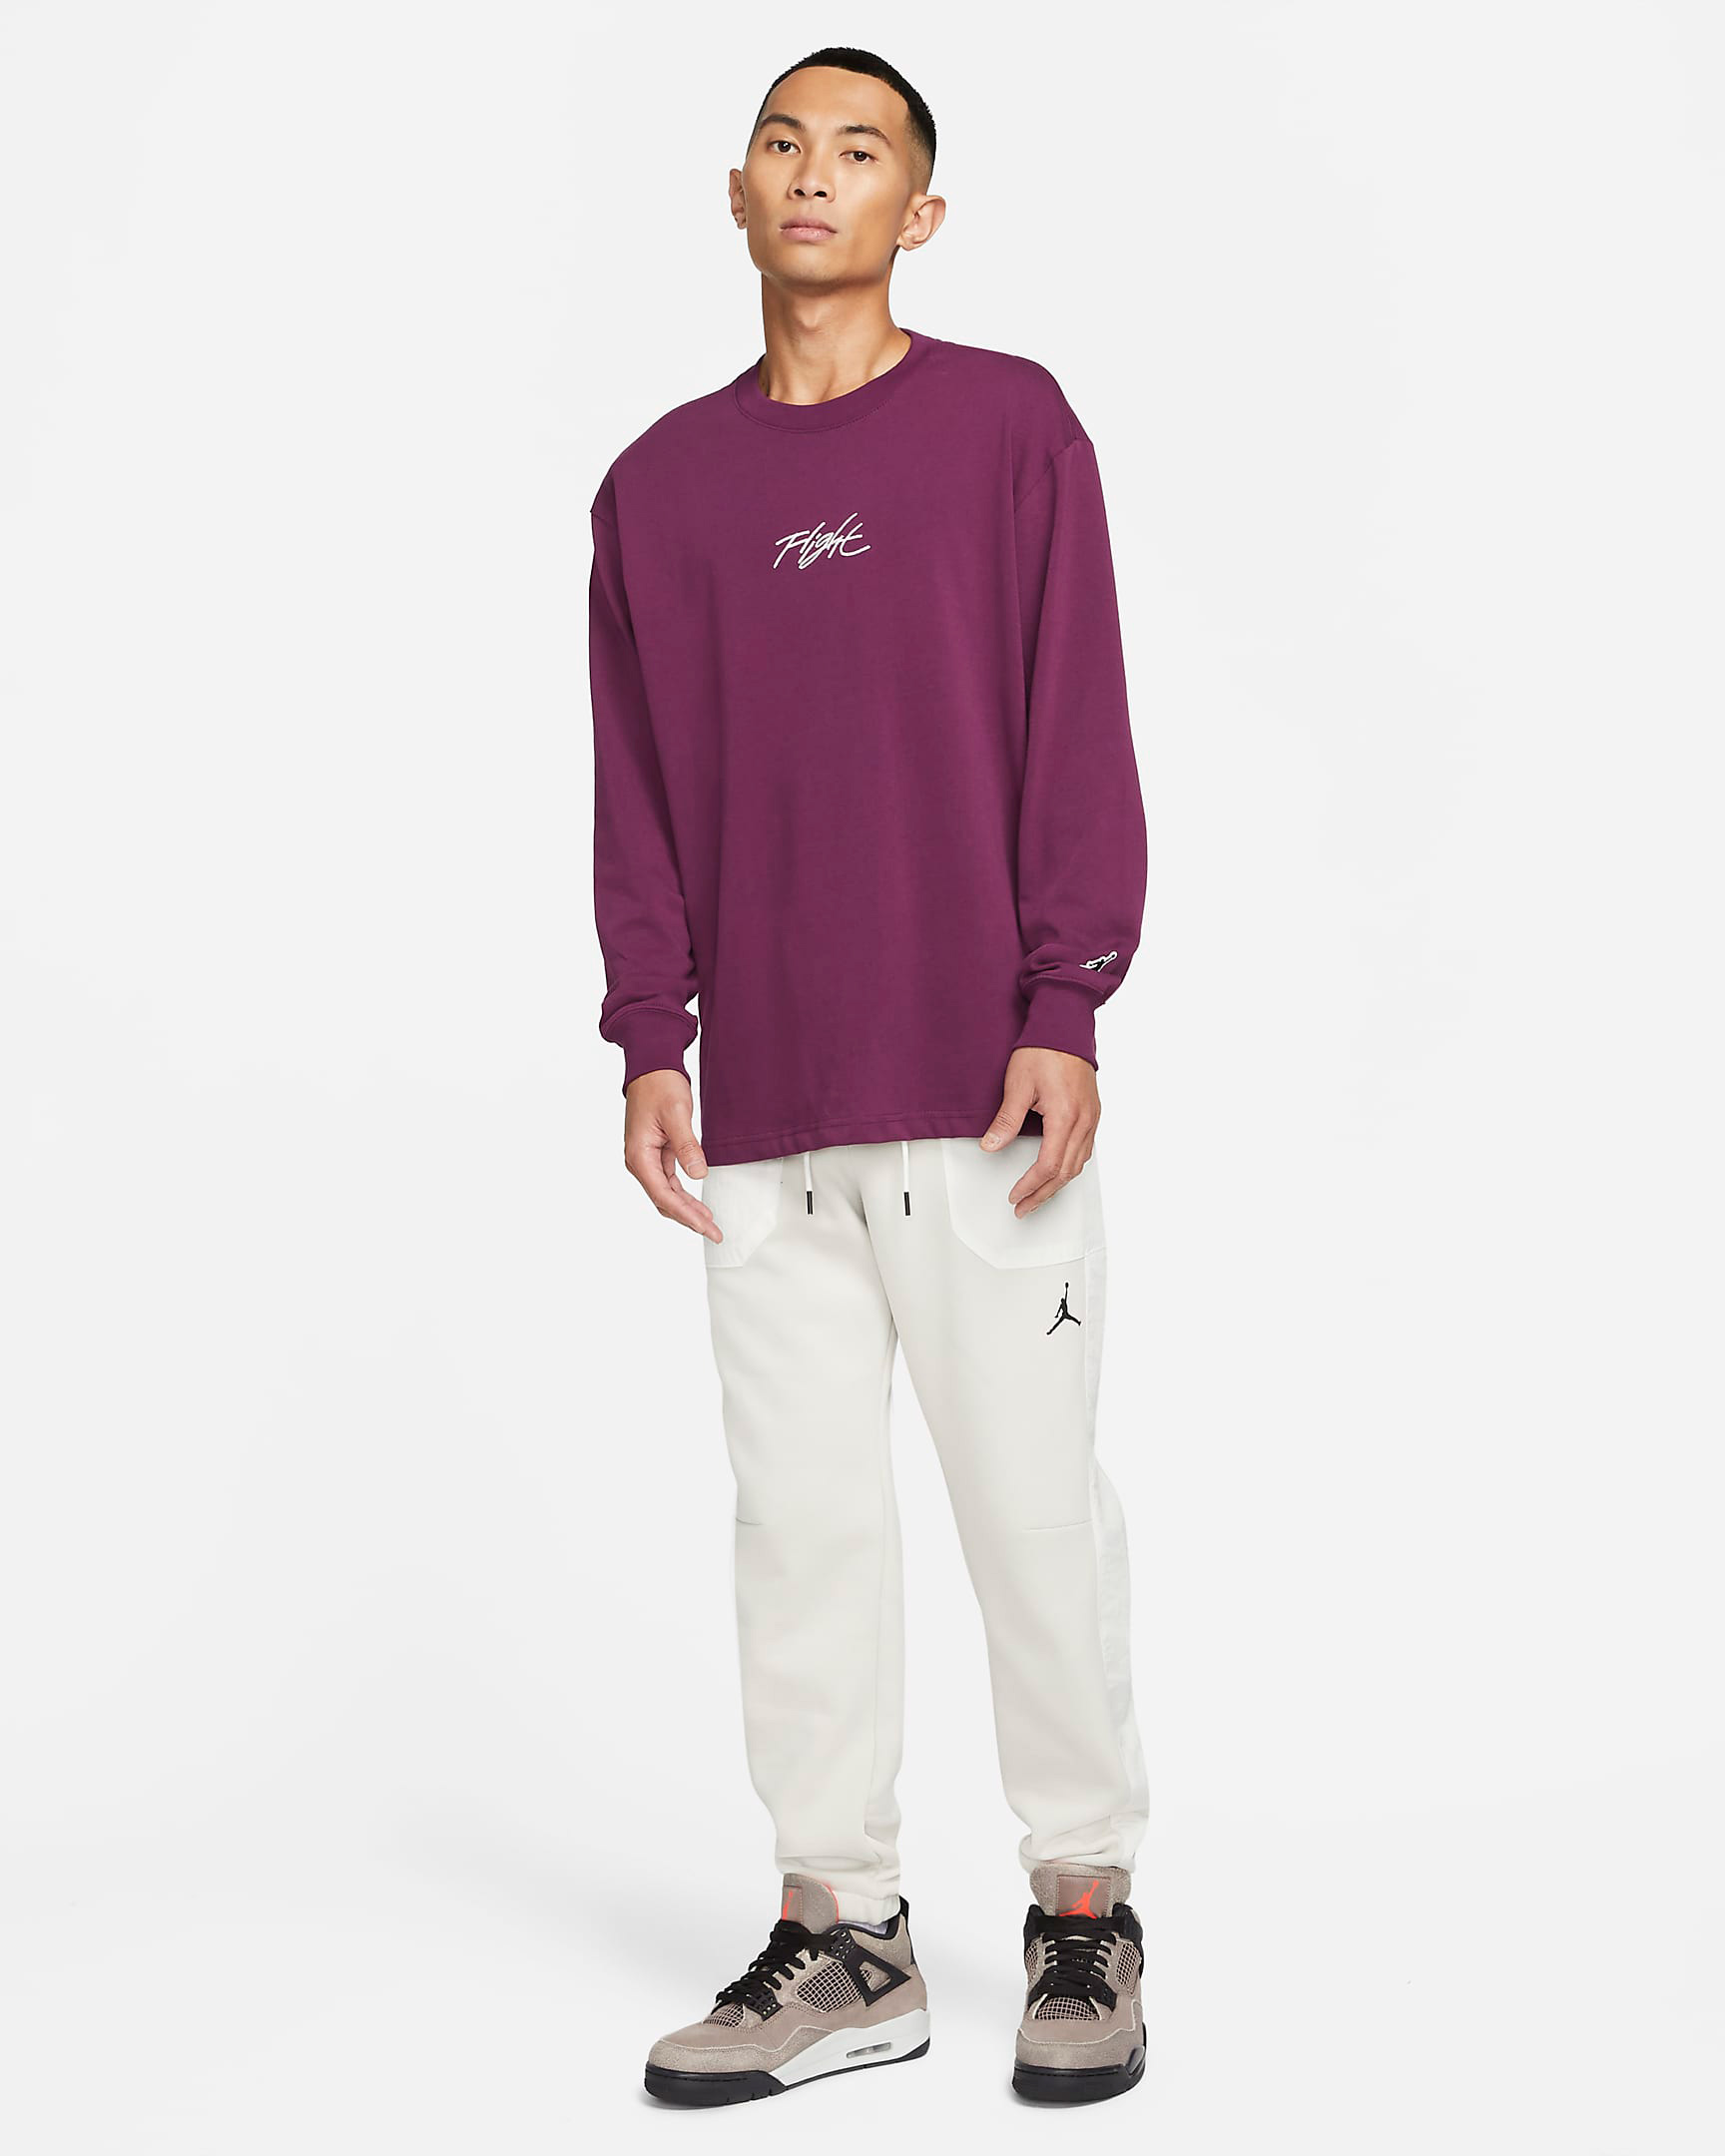 jordan-bordeaux-flight-essentials-long-sleeve-shirt-outfit